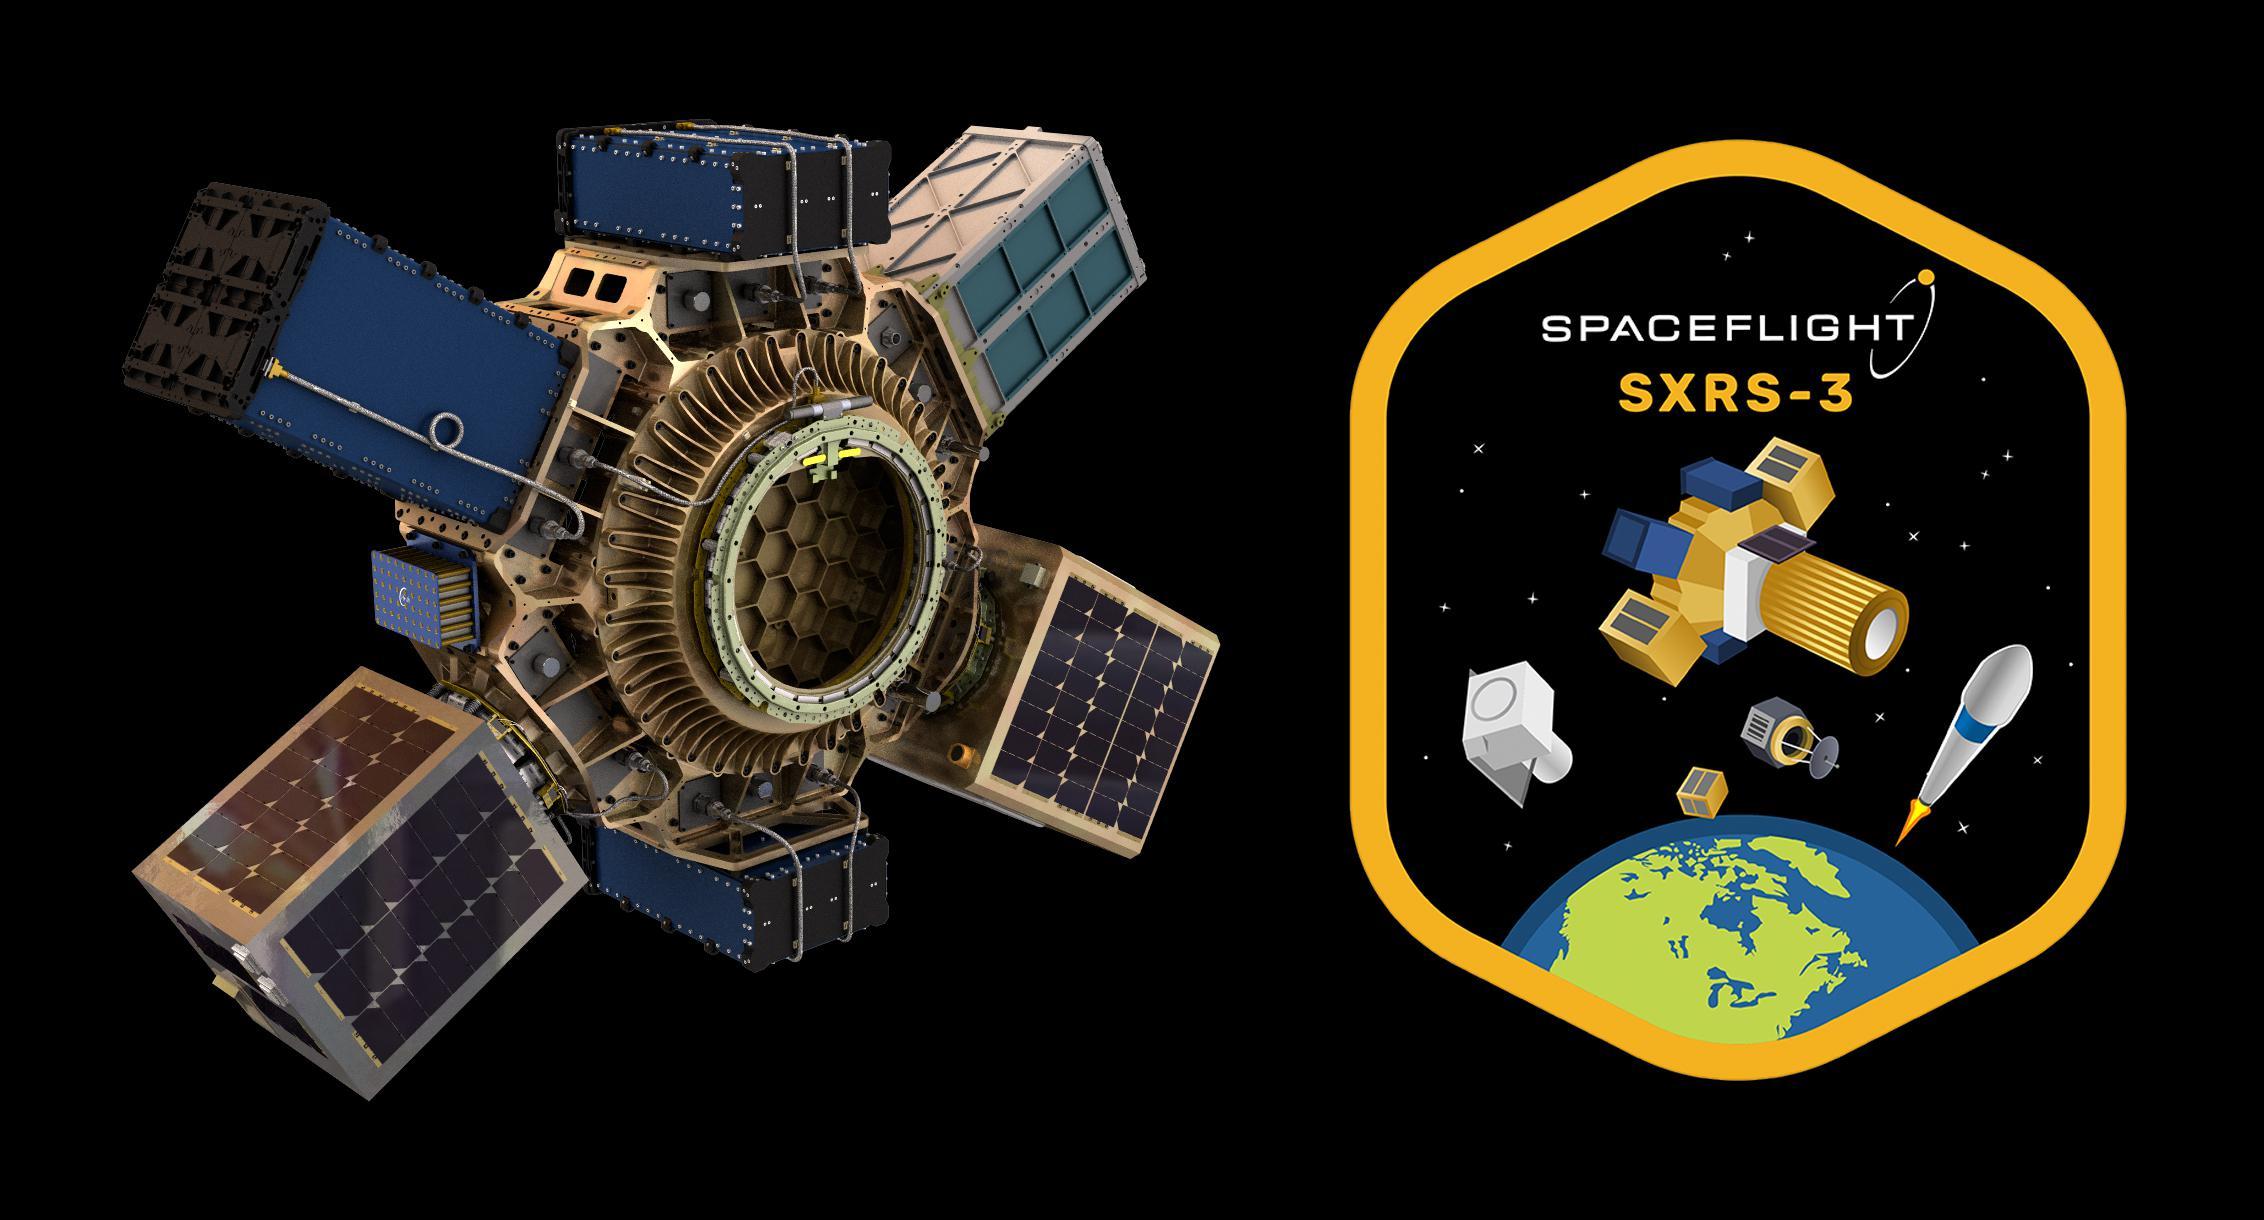 SXRS-3 Sherpa FX (Spaceflight) 2 (c)